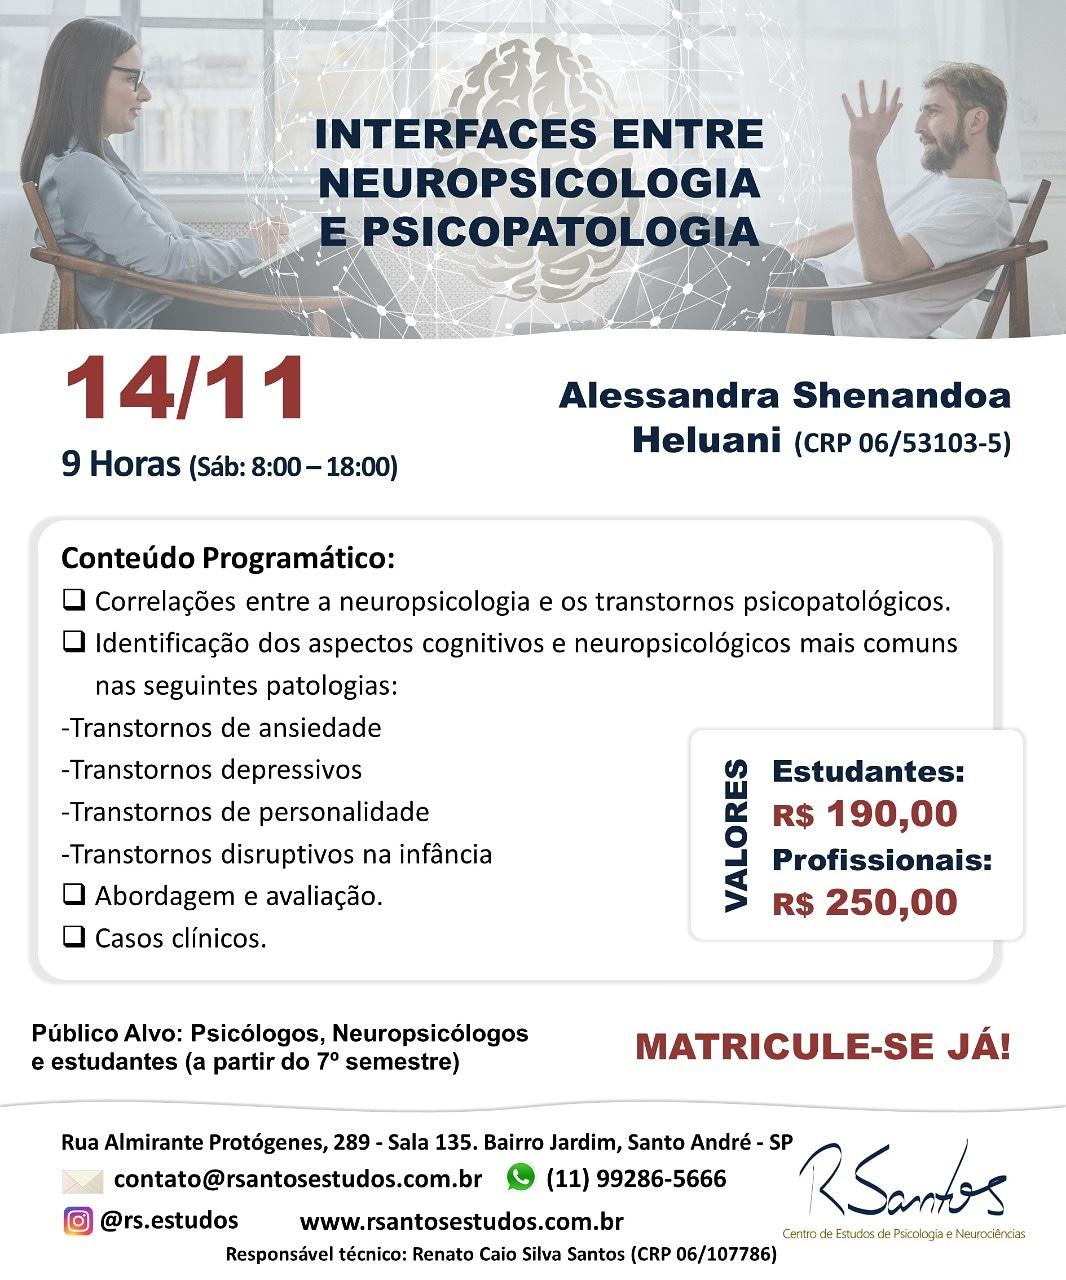 Curso Interfaces entre Neuropsicologia e Psicopatologia – 14/11